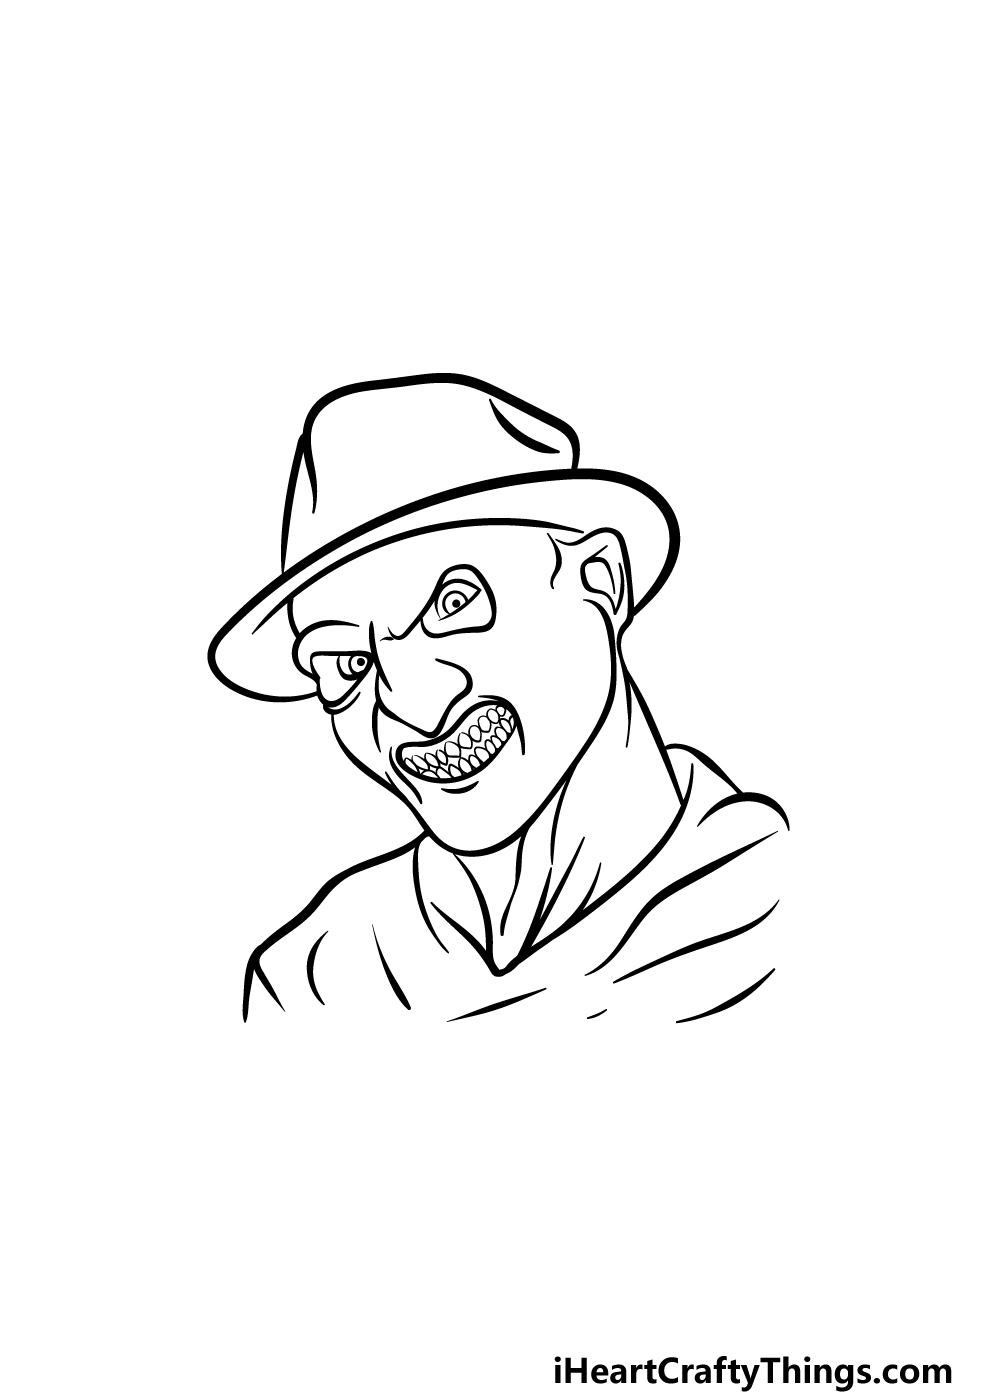 Drawing Freddy Krueger step 3